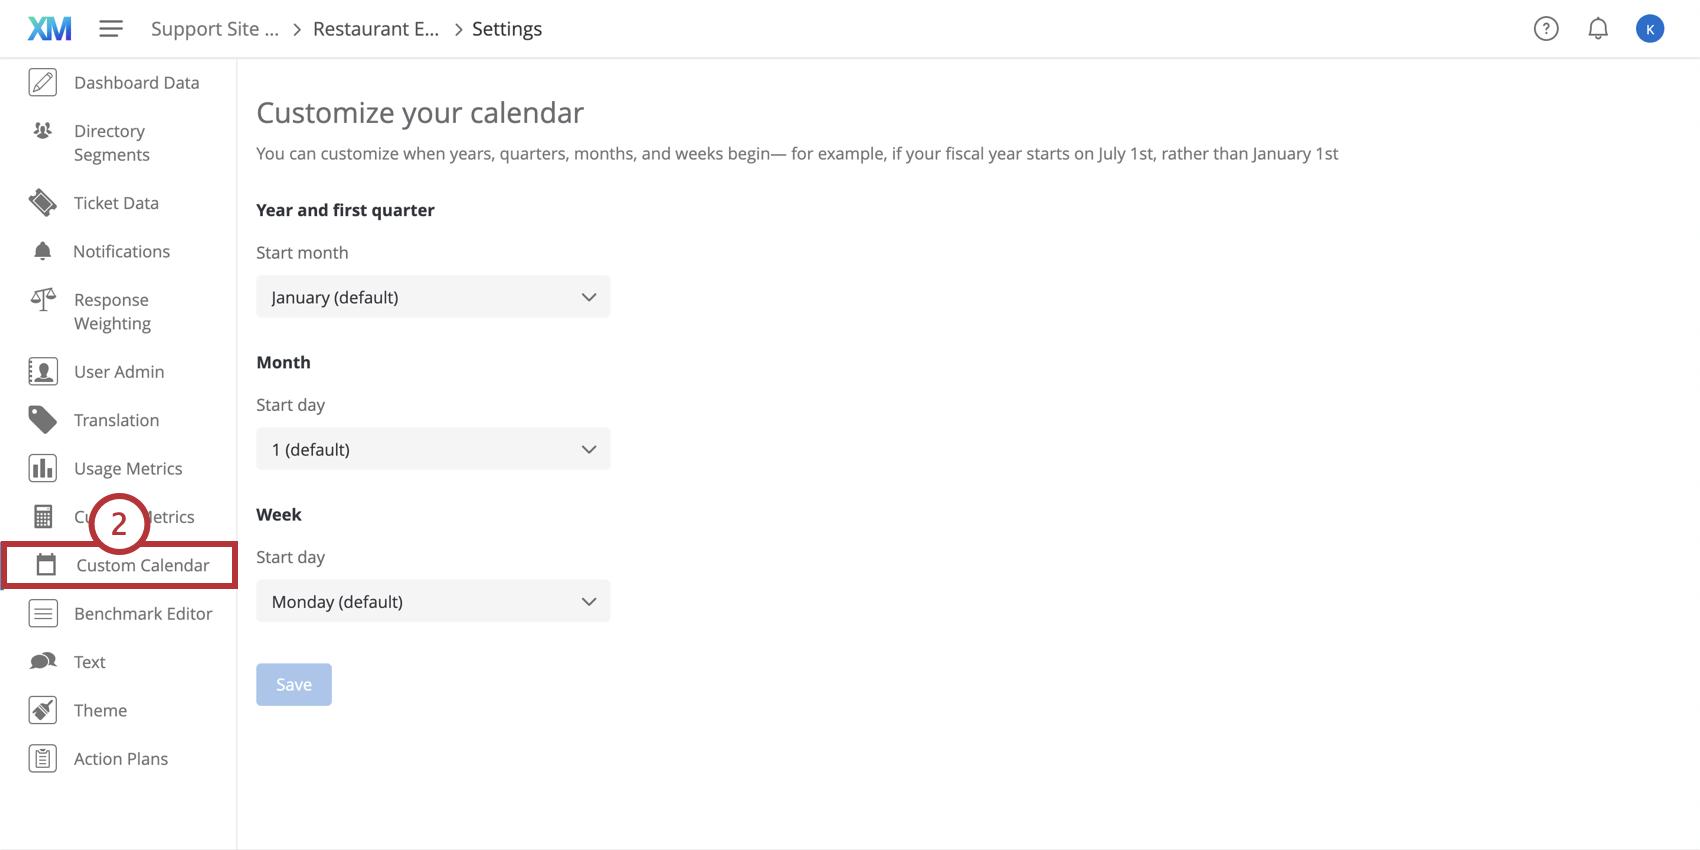 Selecting the Custom Calendar tab in the dashboard settings